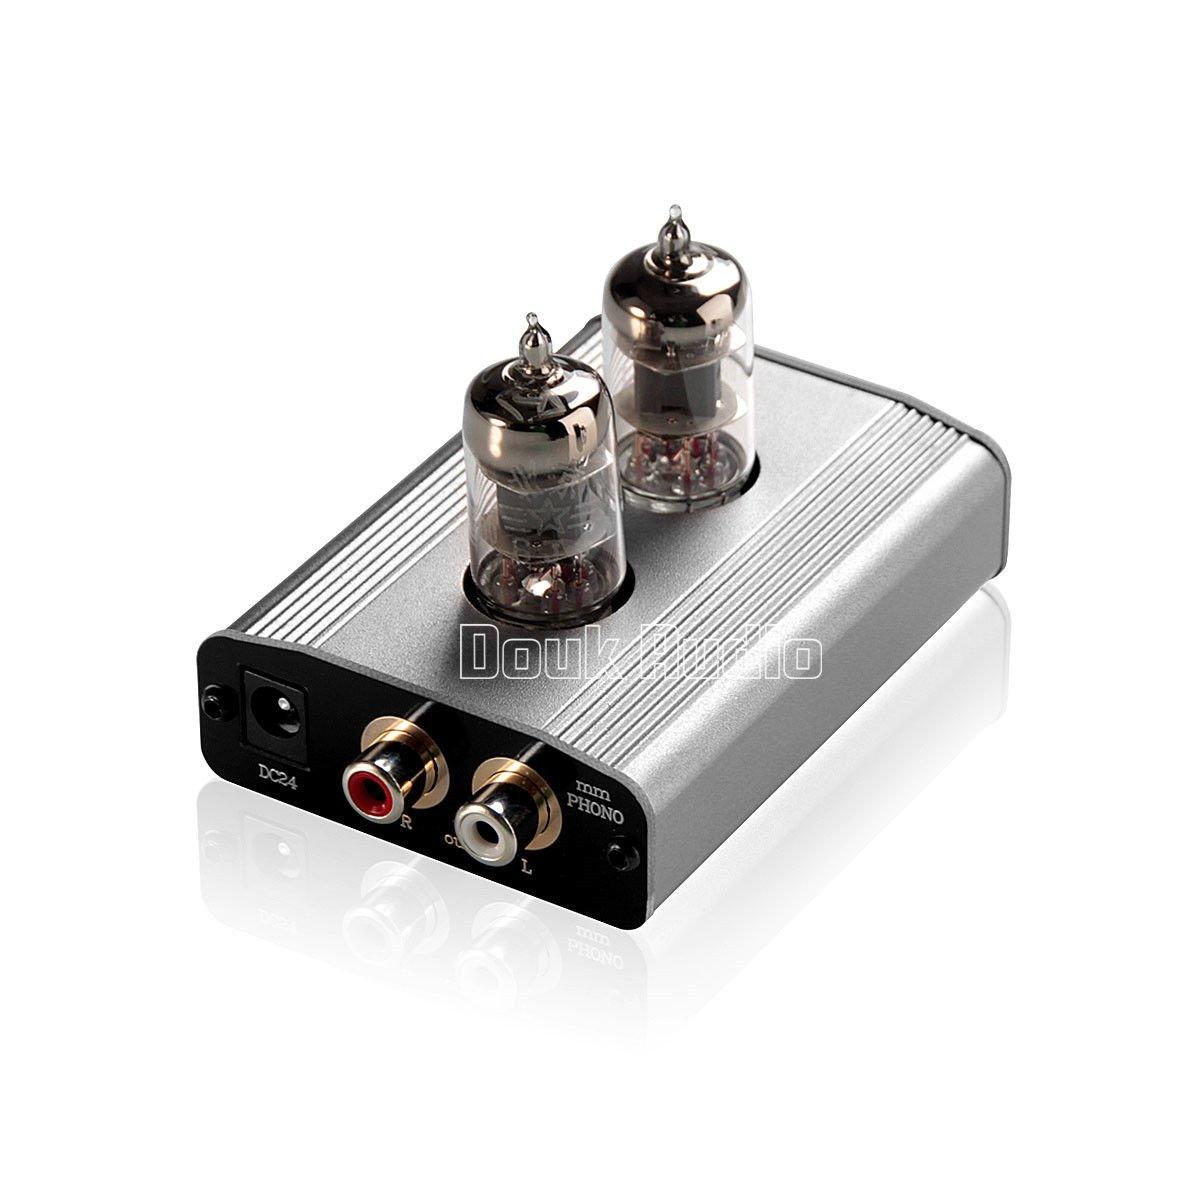 Douk Audio 6J1 Tubo Phono Preamplificador MM RIAA Tocadiscos ...